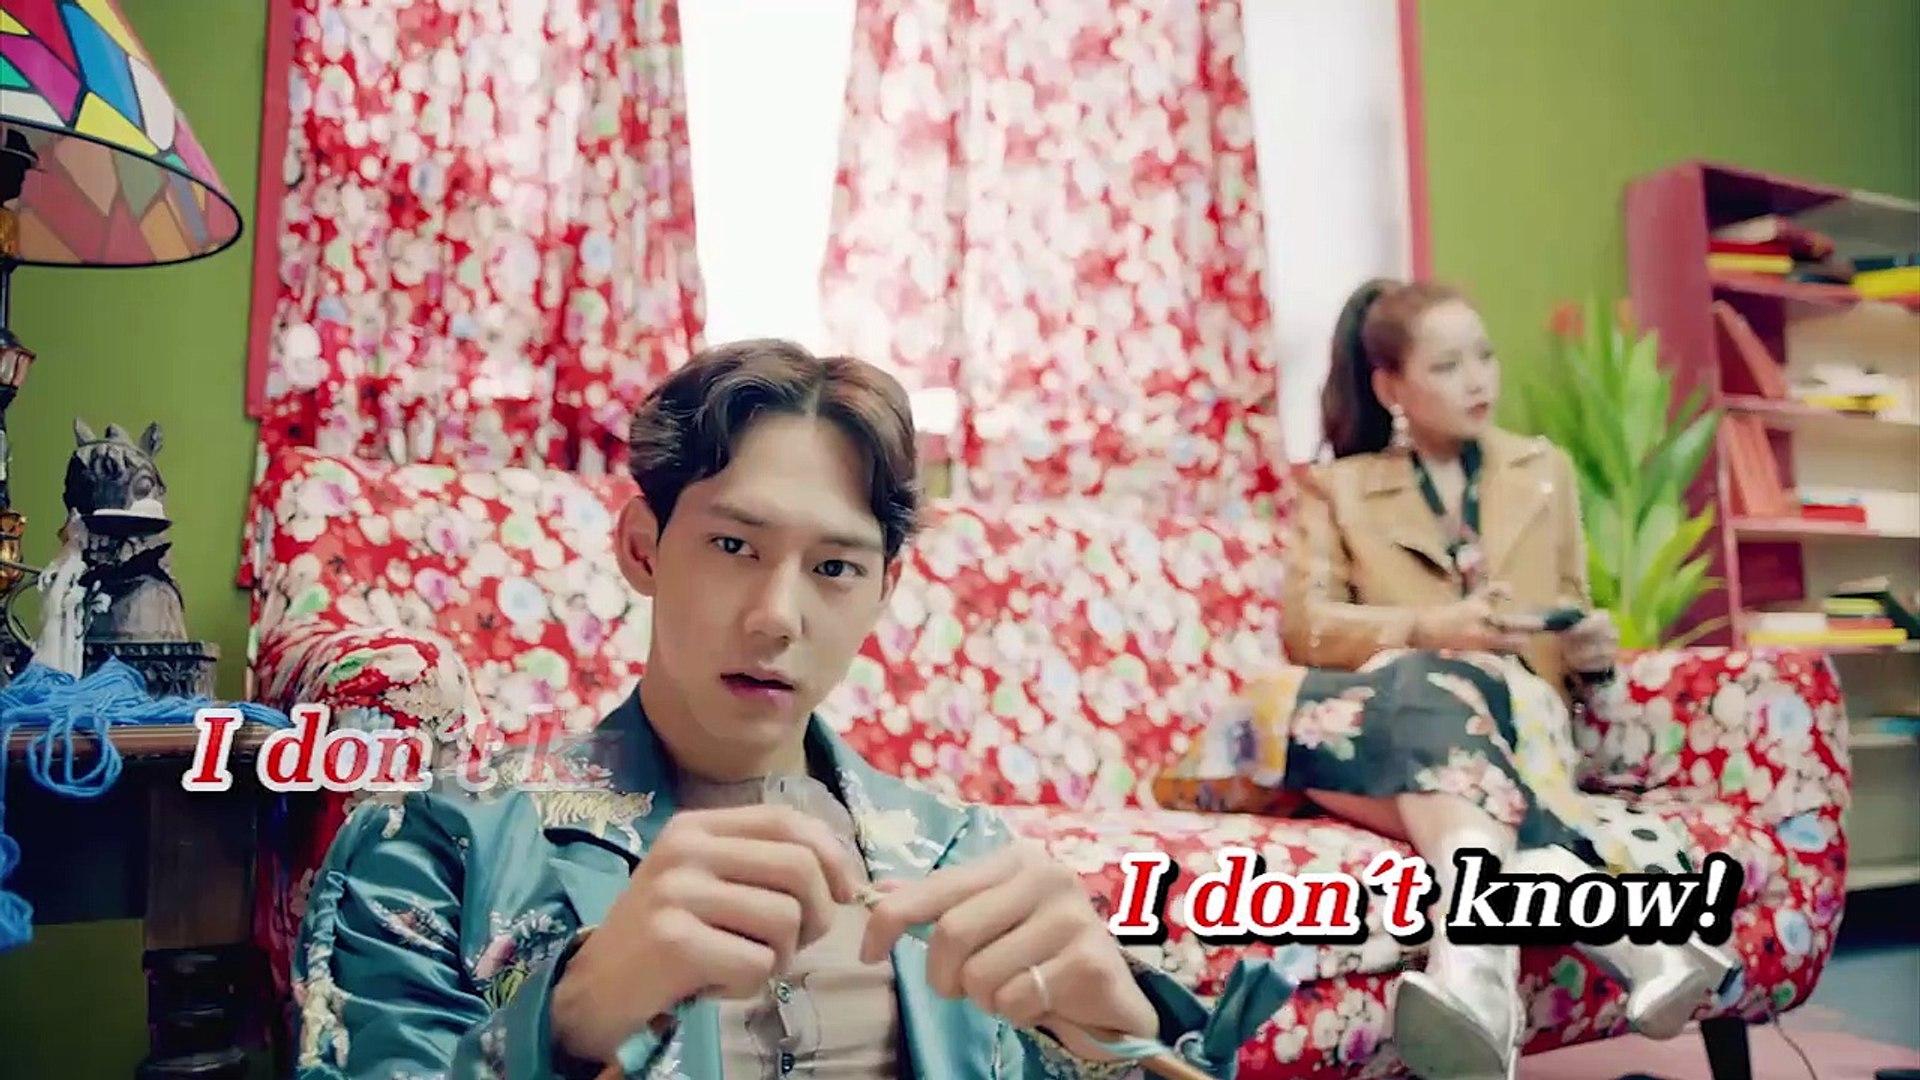 [Karaoke] Cho Ta Gần Hơn (I'm In Love) - Chi Pu [Beat]